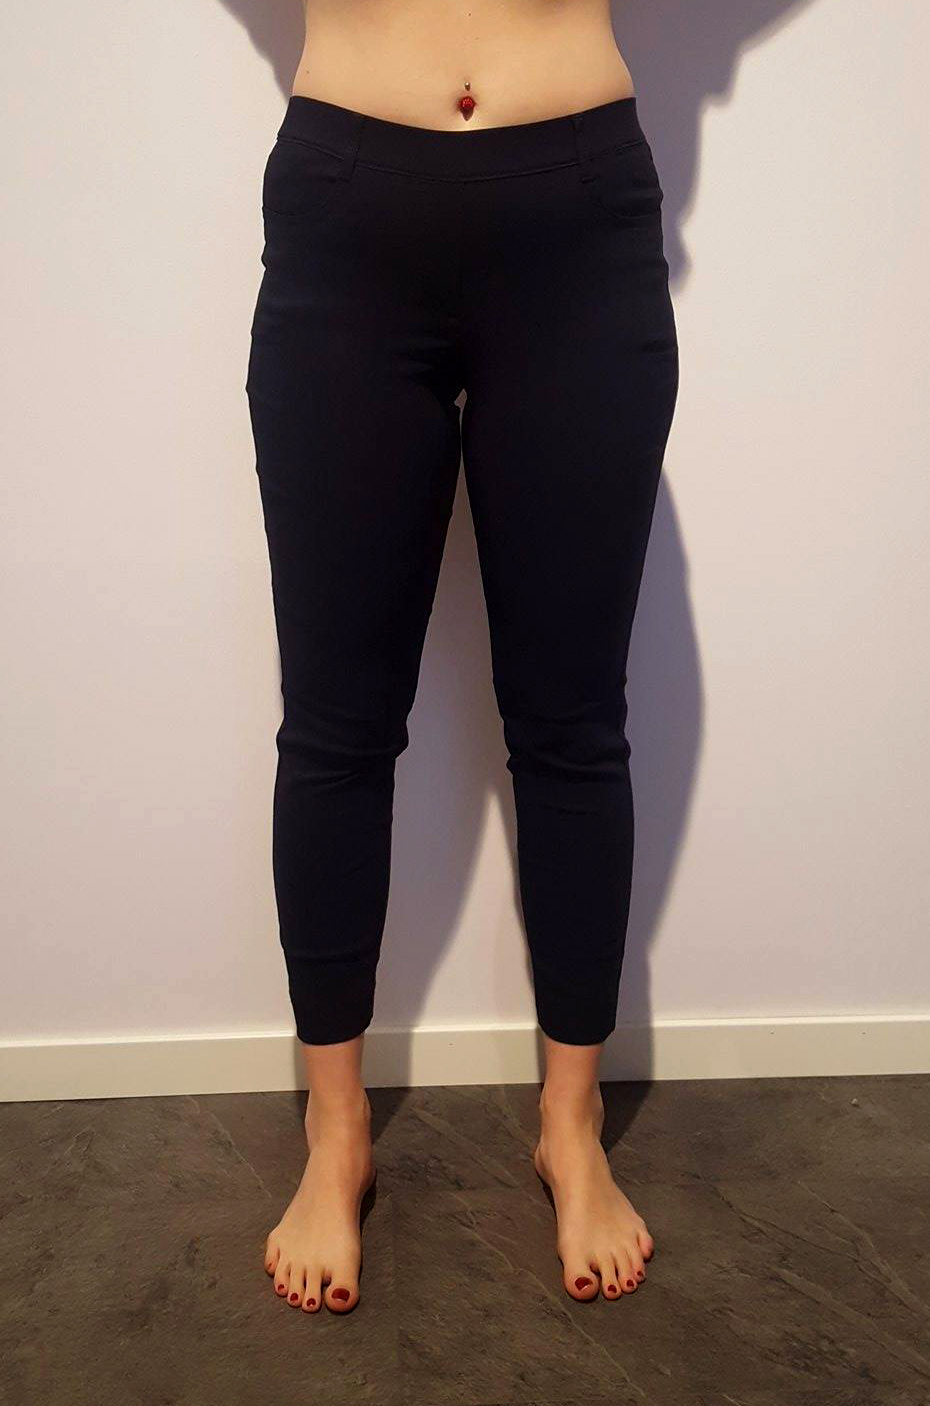 Jeans i kort längd med dragkedja i benslutet. Pris 899:-